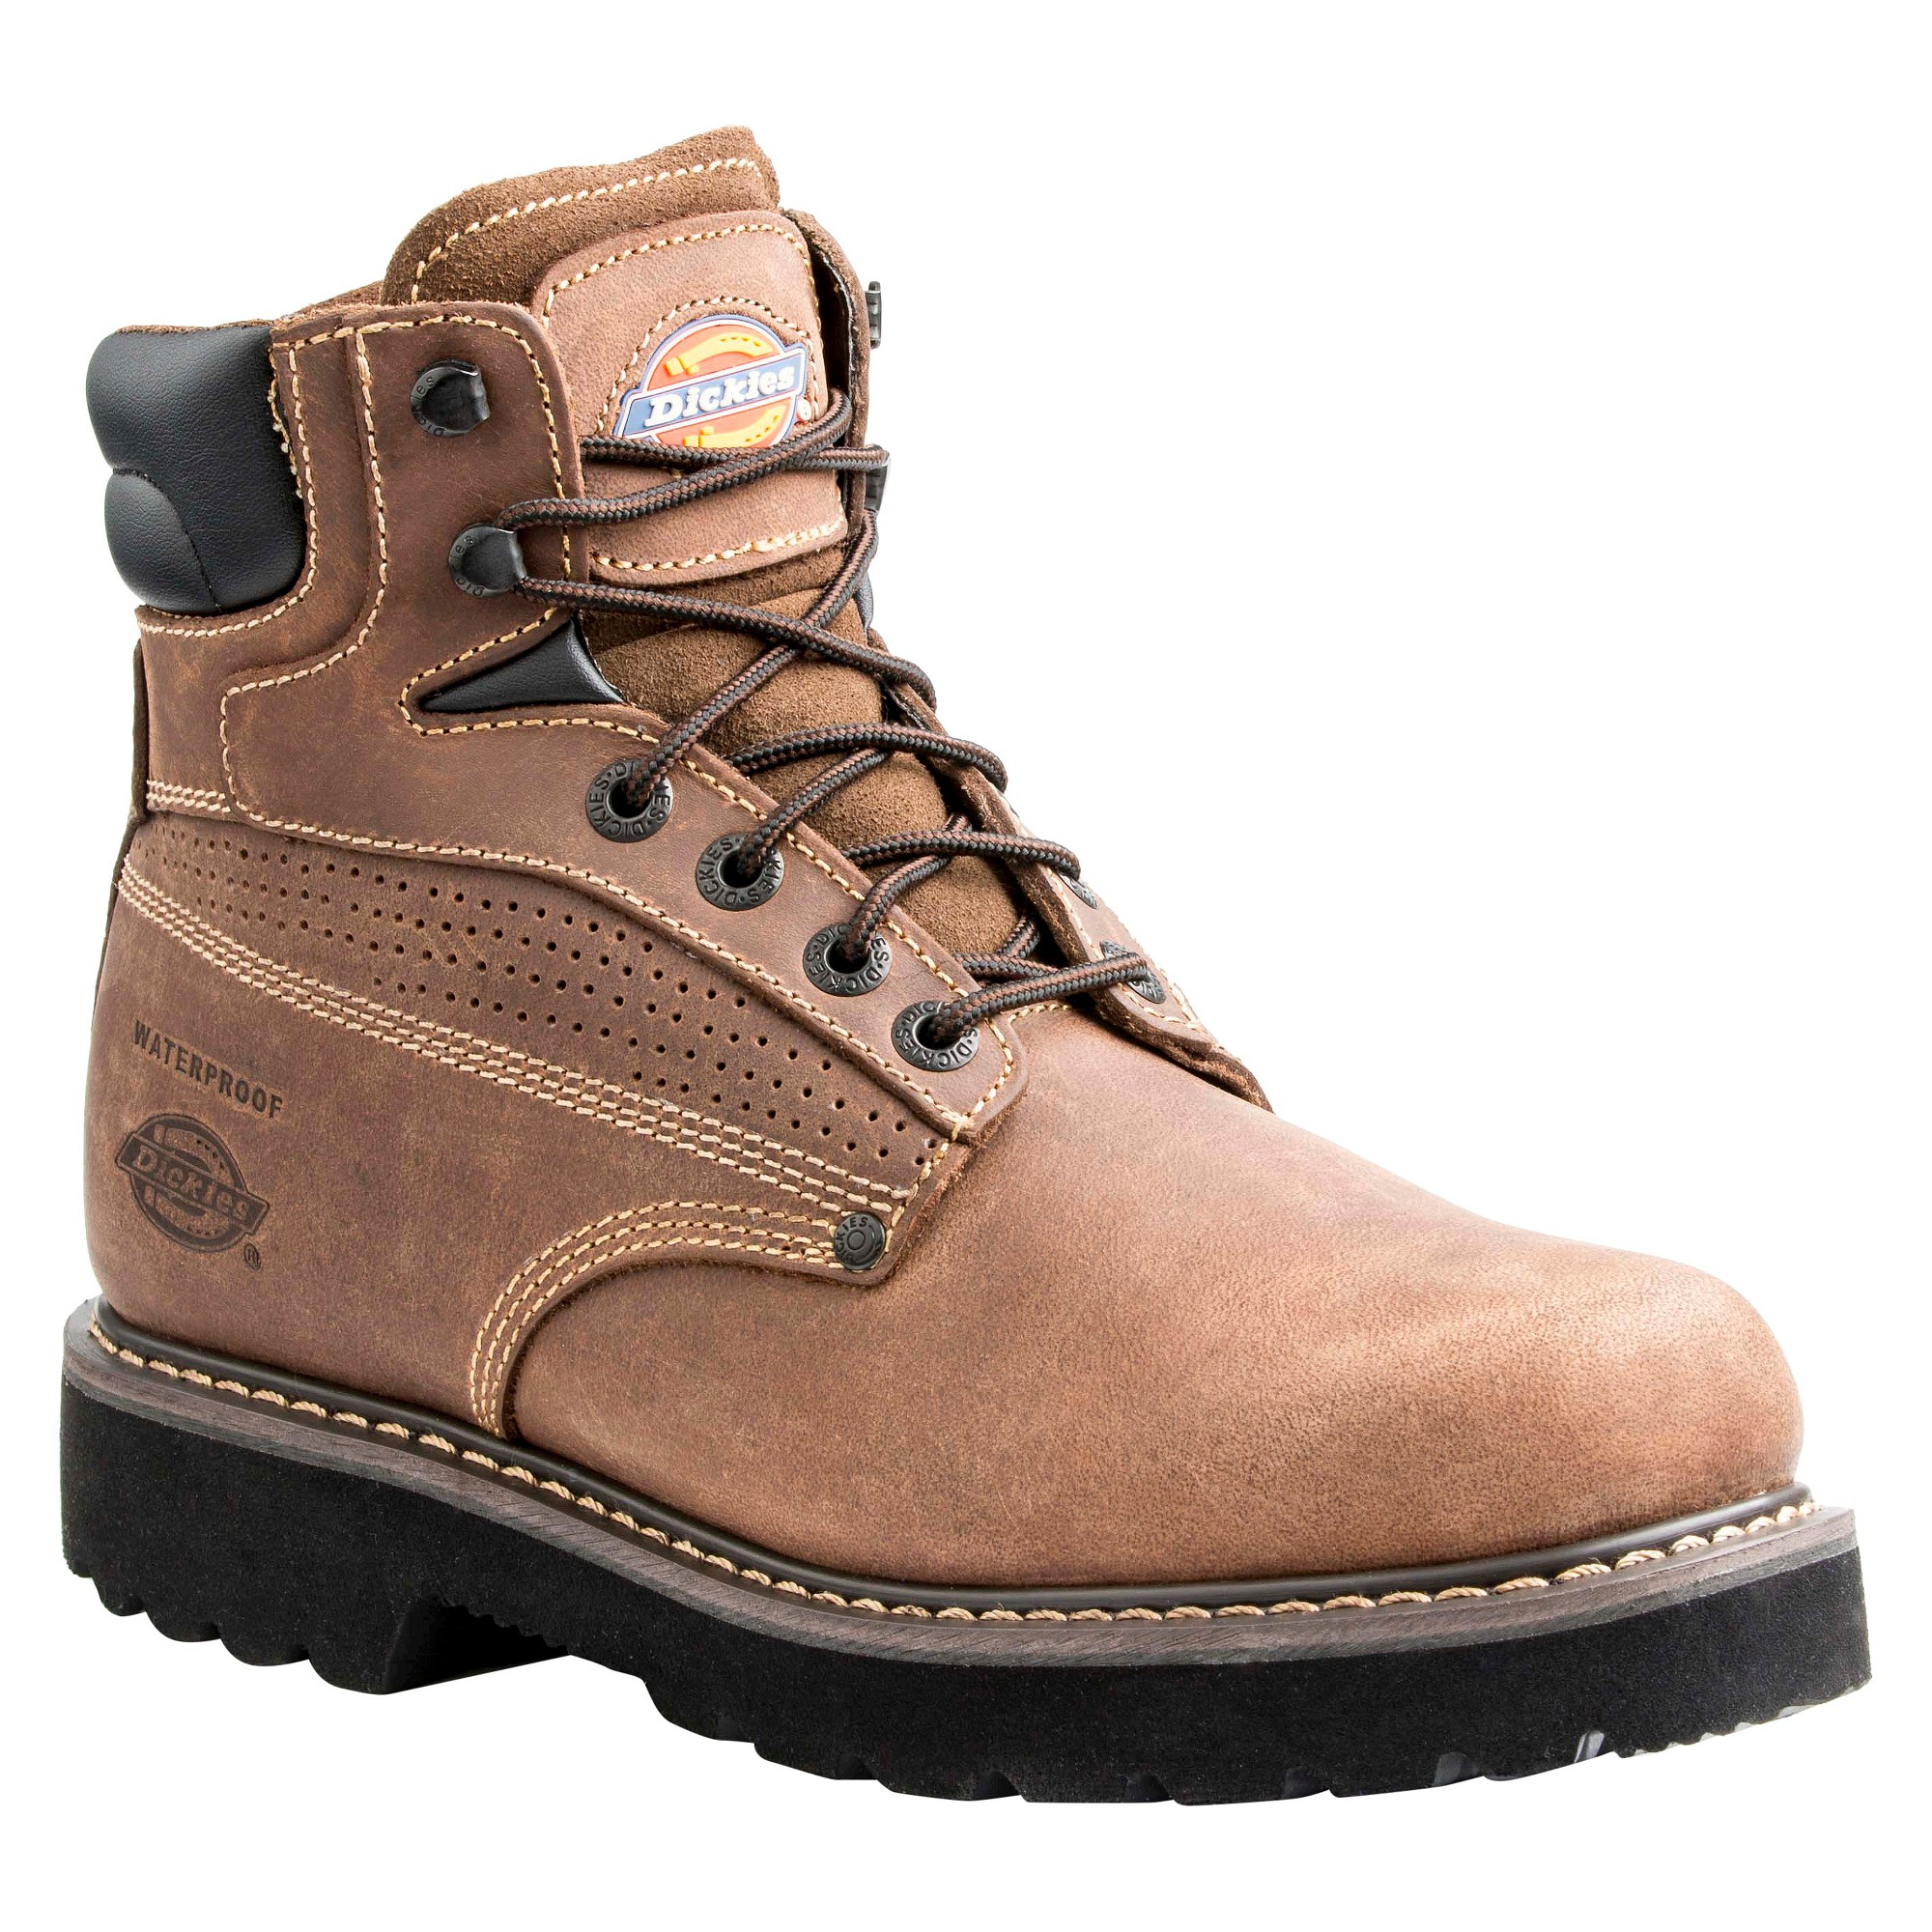 Men's Dickies Breaker Work Boots - Brown 8.5